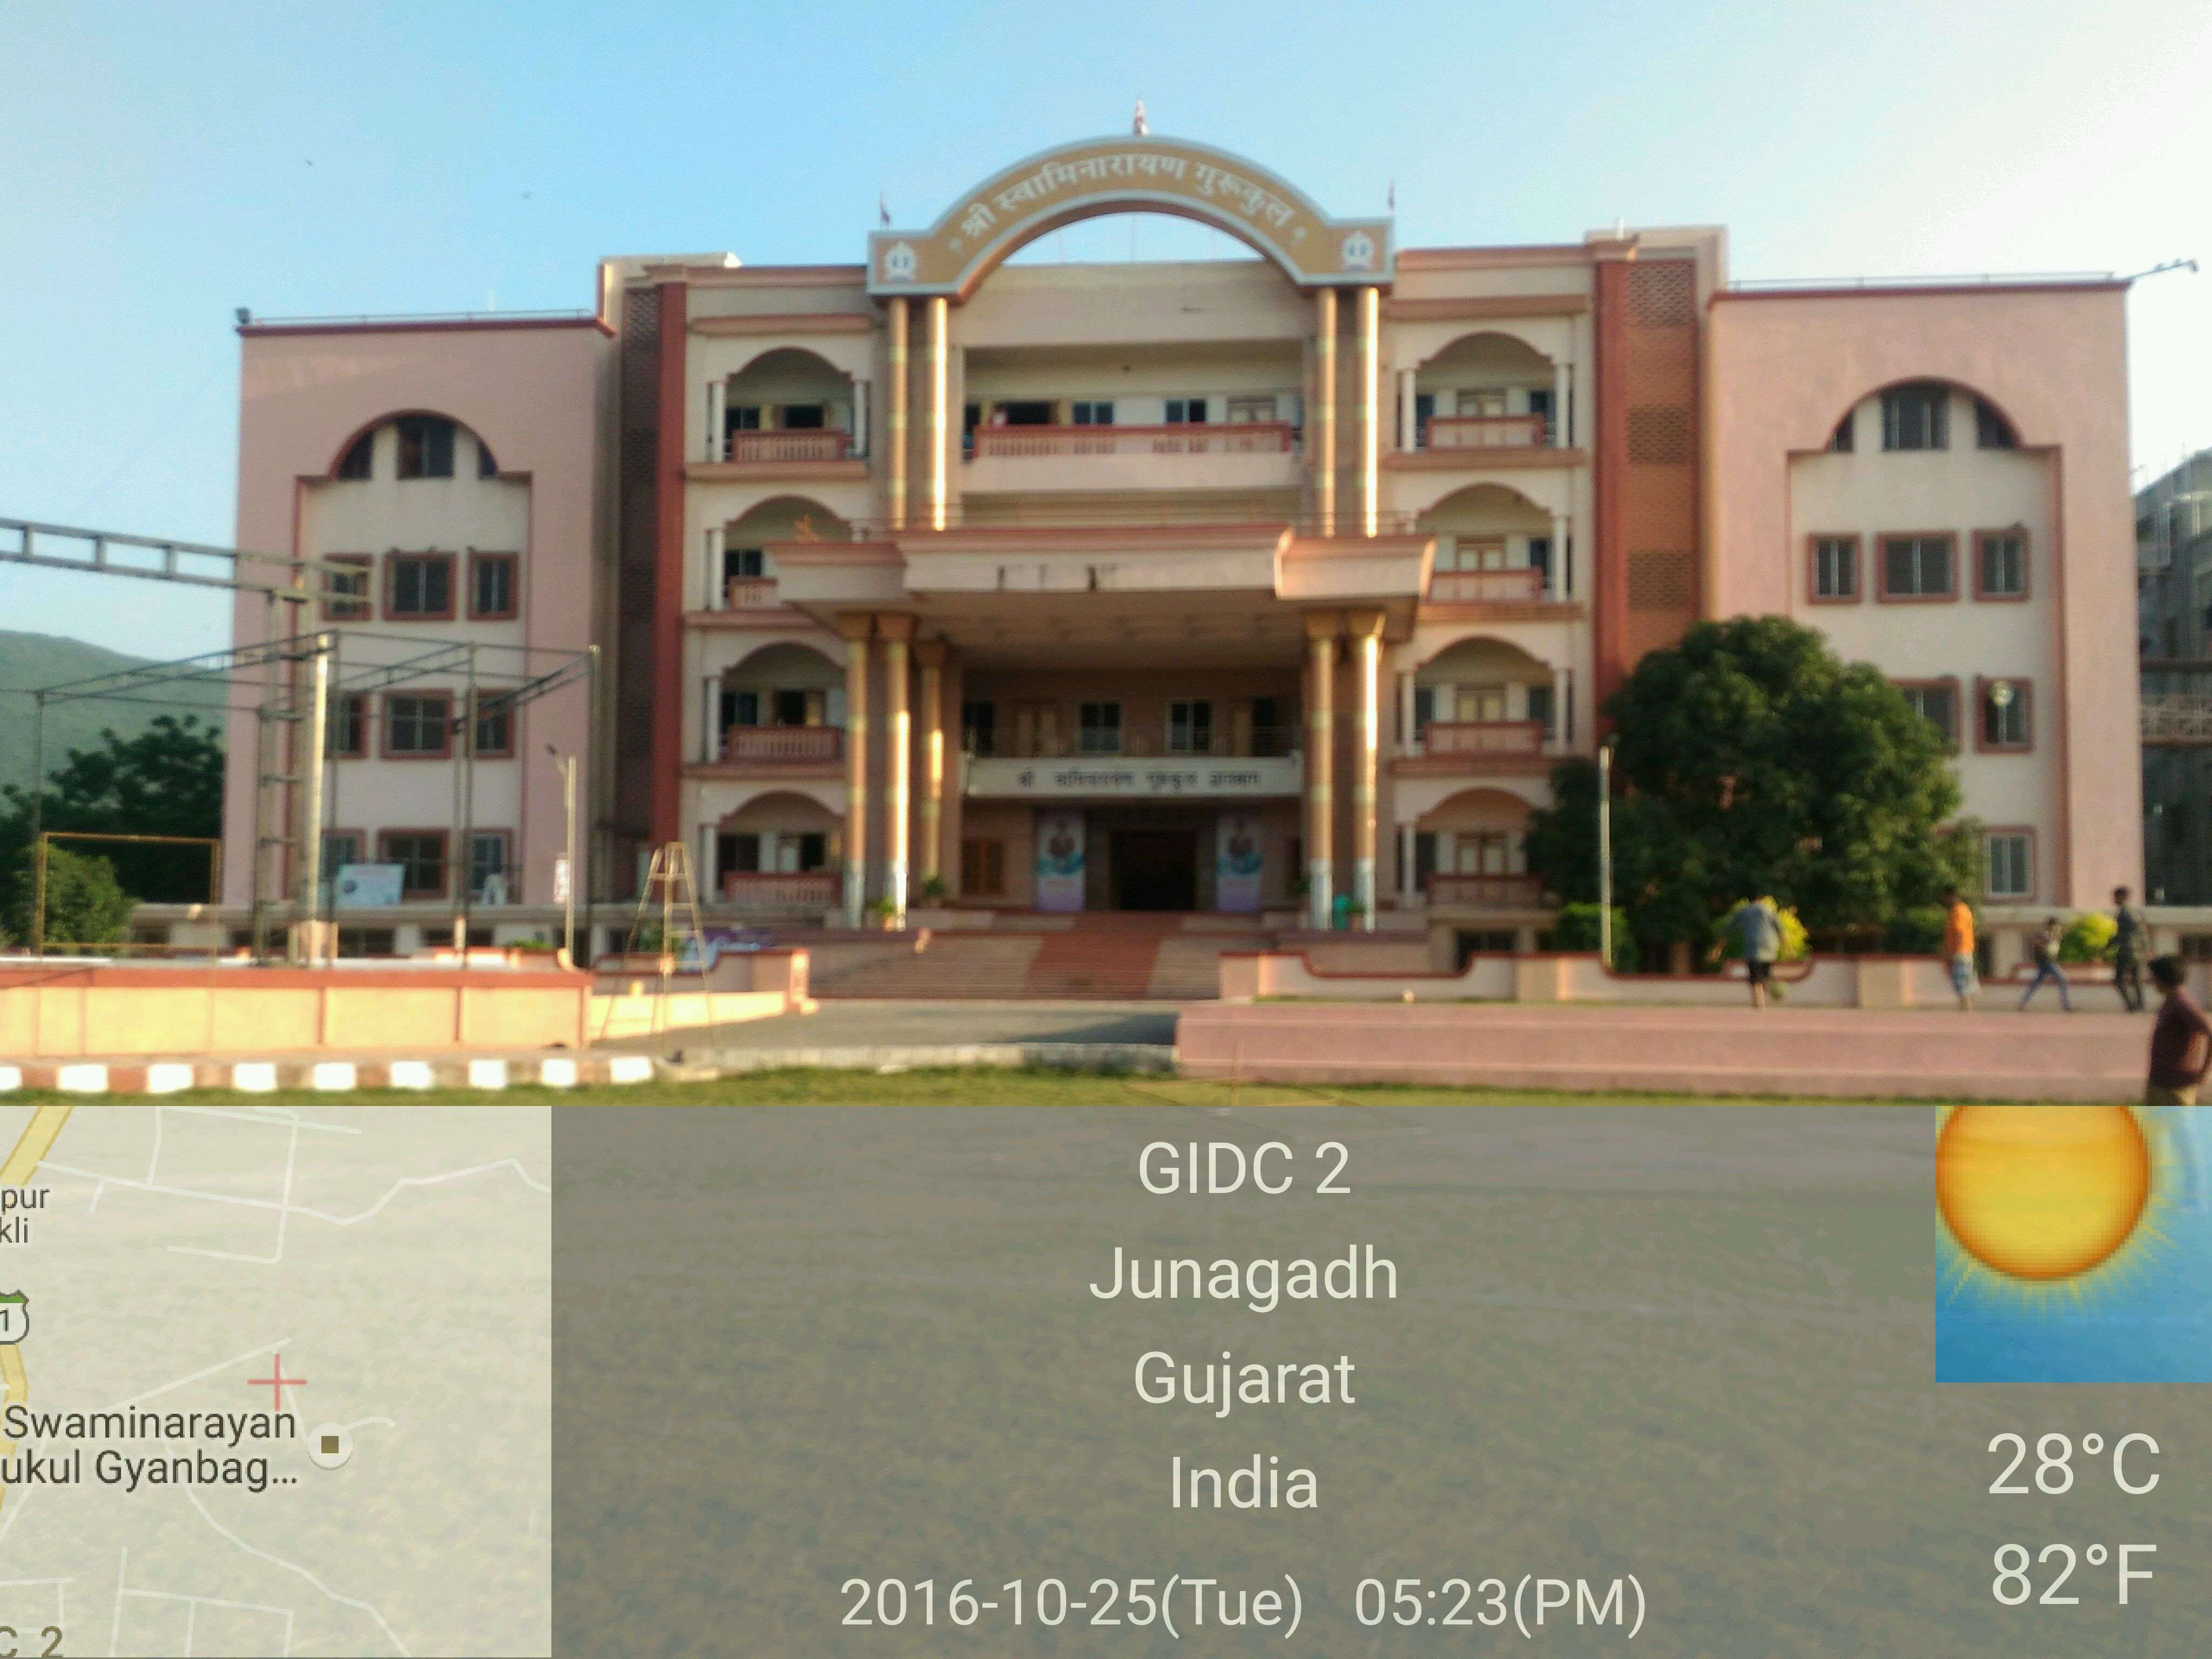 Shree Swaminarayan Gurukul Gyanbag International School Rajkot highway Nr Gyanbag circle Junagadh 430176